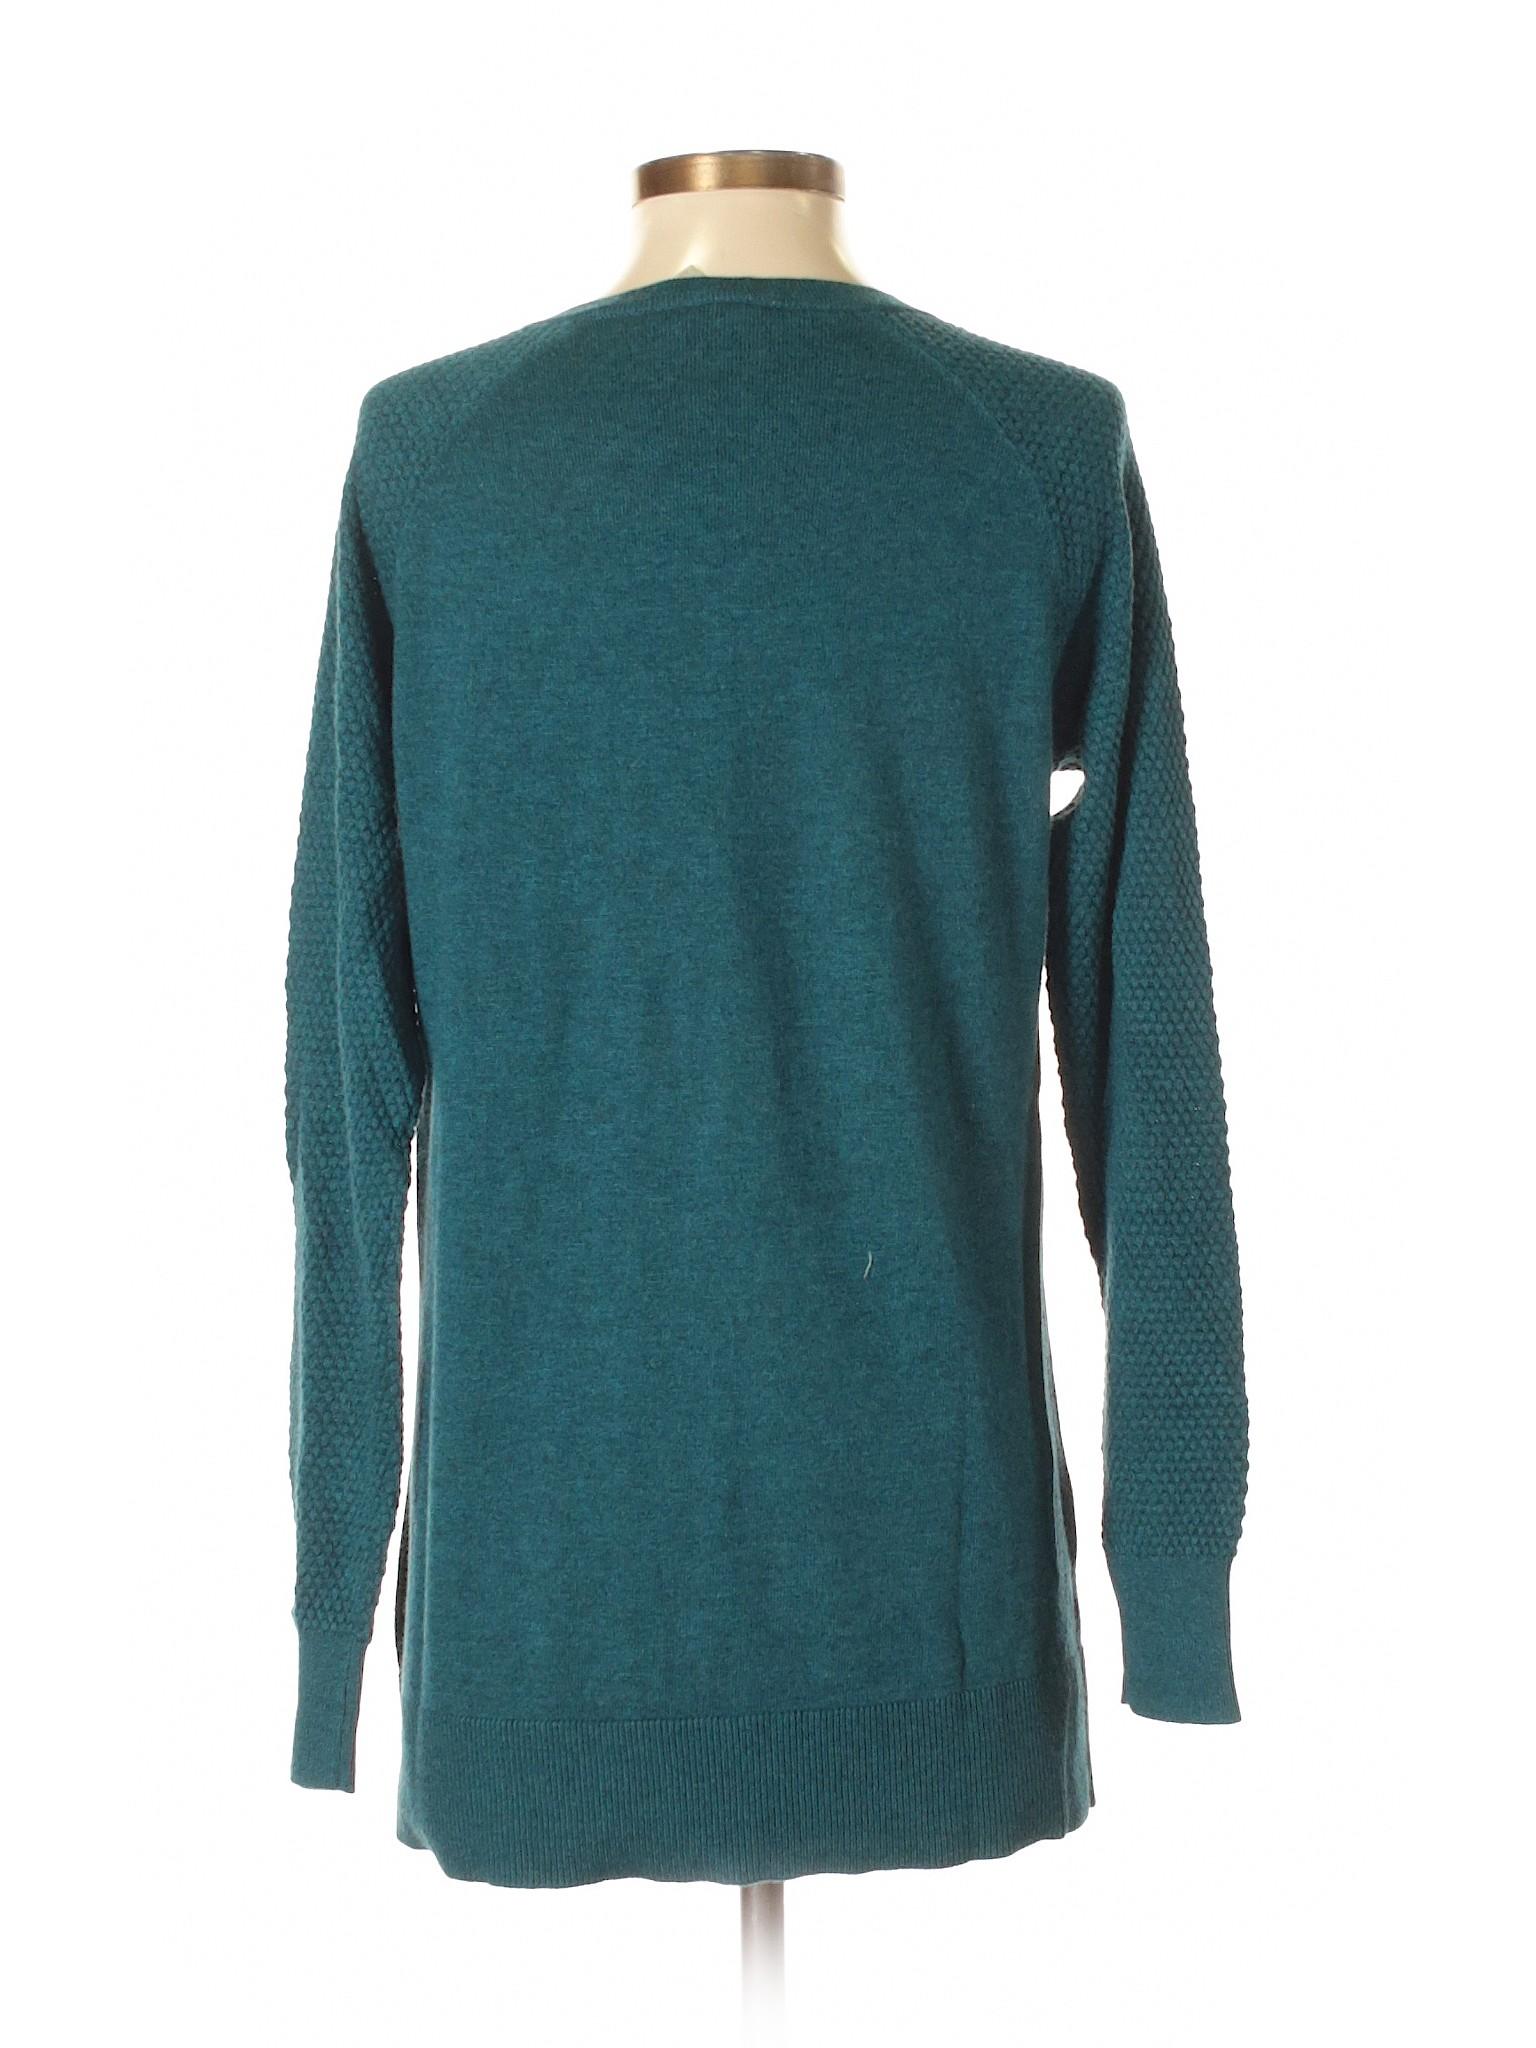 Pullover Sweater Taylor Ann Boutique LOFT qSvtwgxnP7